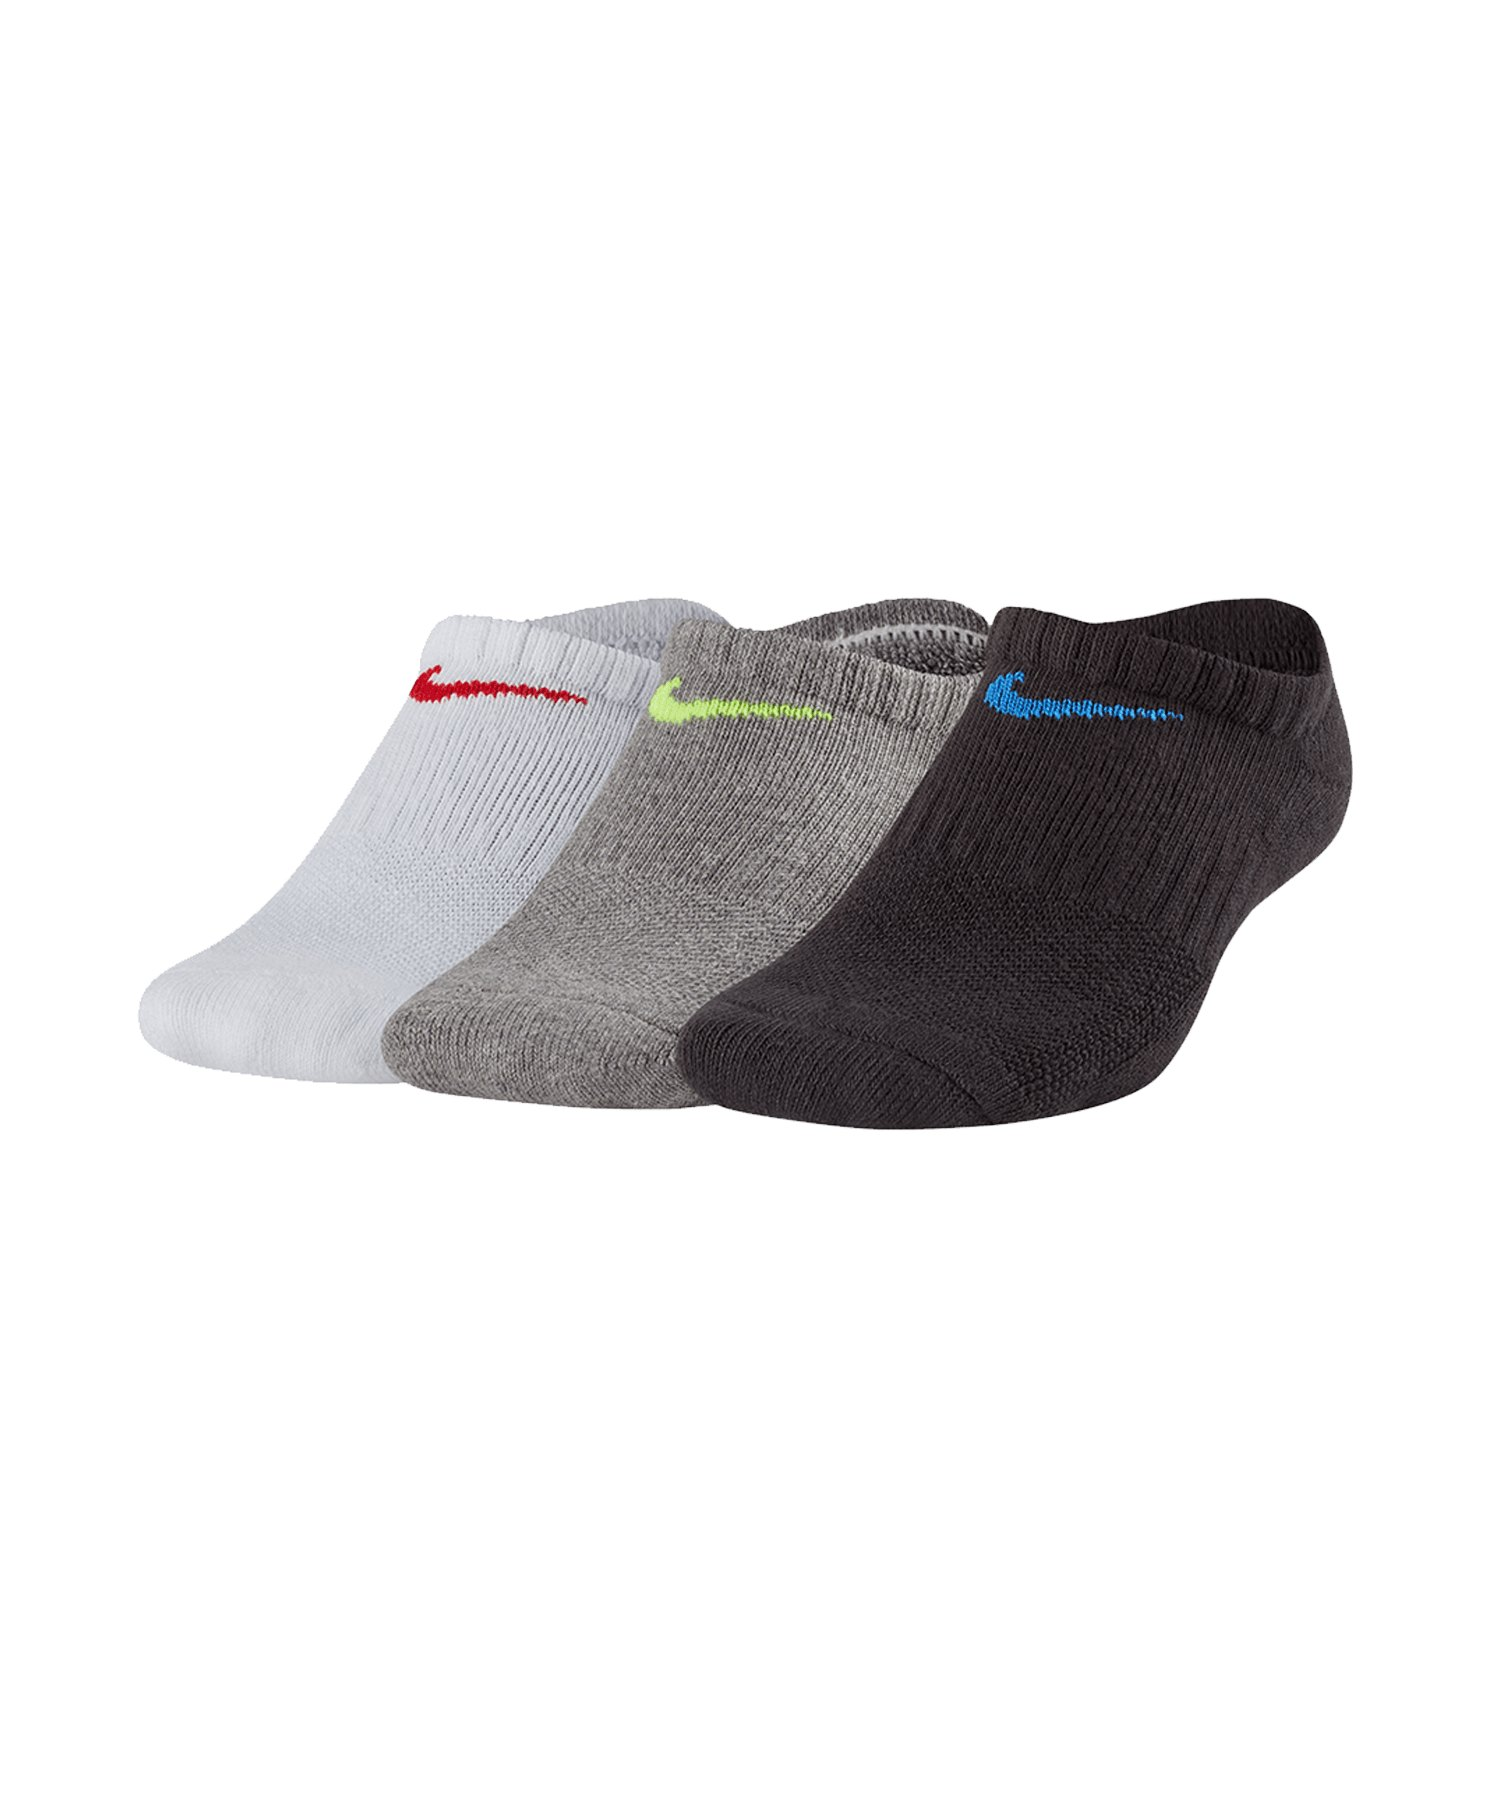 Nike Cushioned No Show Socken 3er Pack Kids F906 - weiss